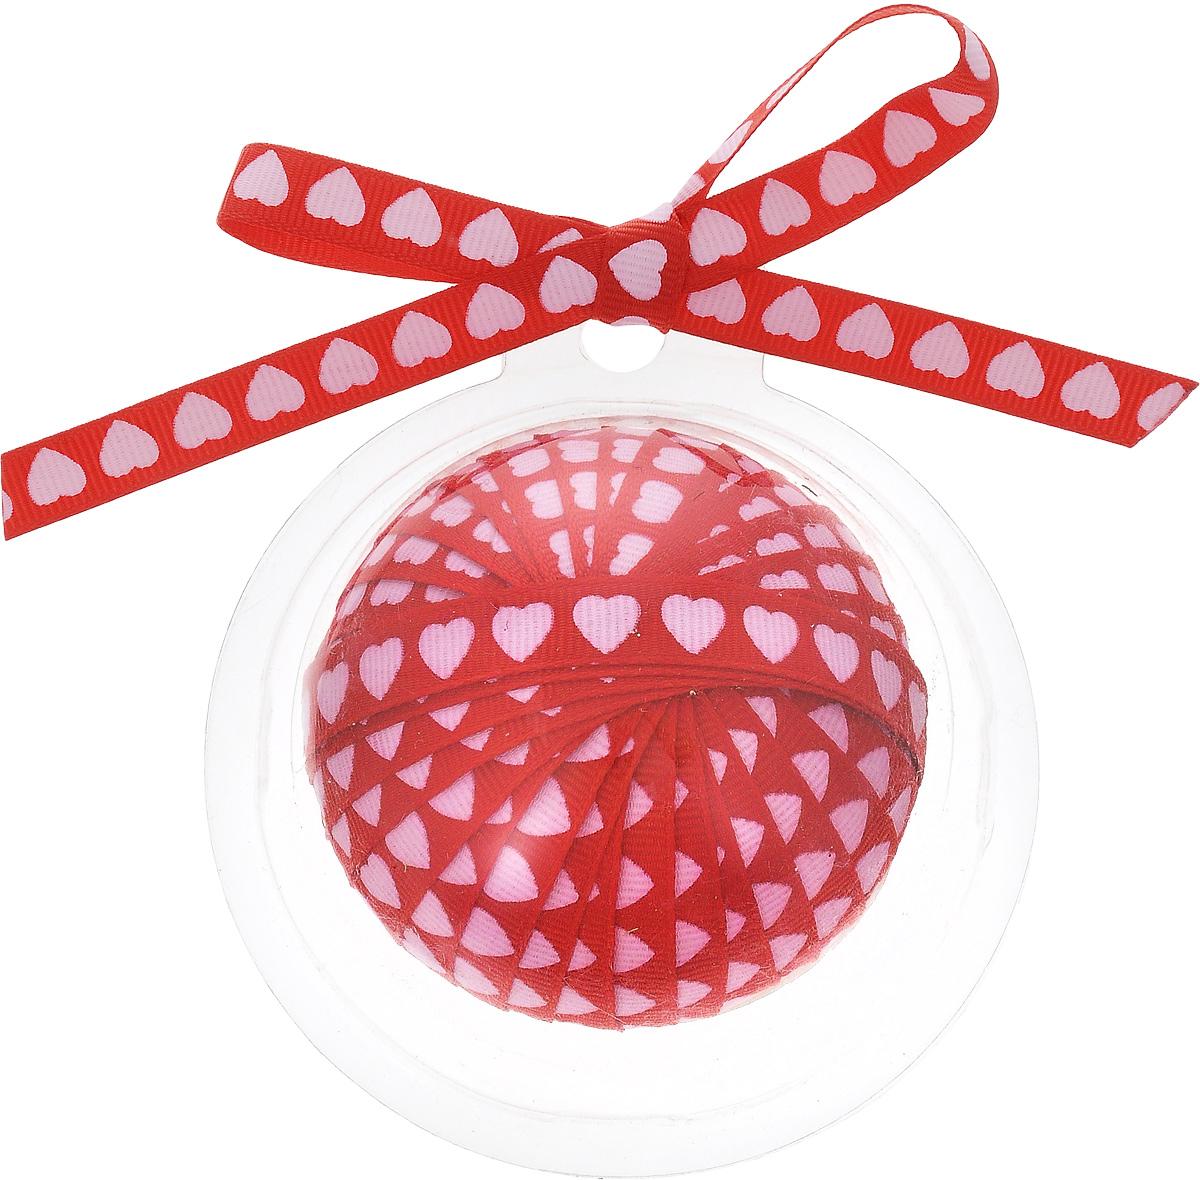 Лента новогодняя Winter Wings, цвет: красный, светло-розовый, 1 см х 3 м лента декоративная brunnen цвет золото 1 5 х 300 см